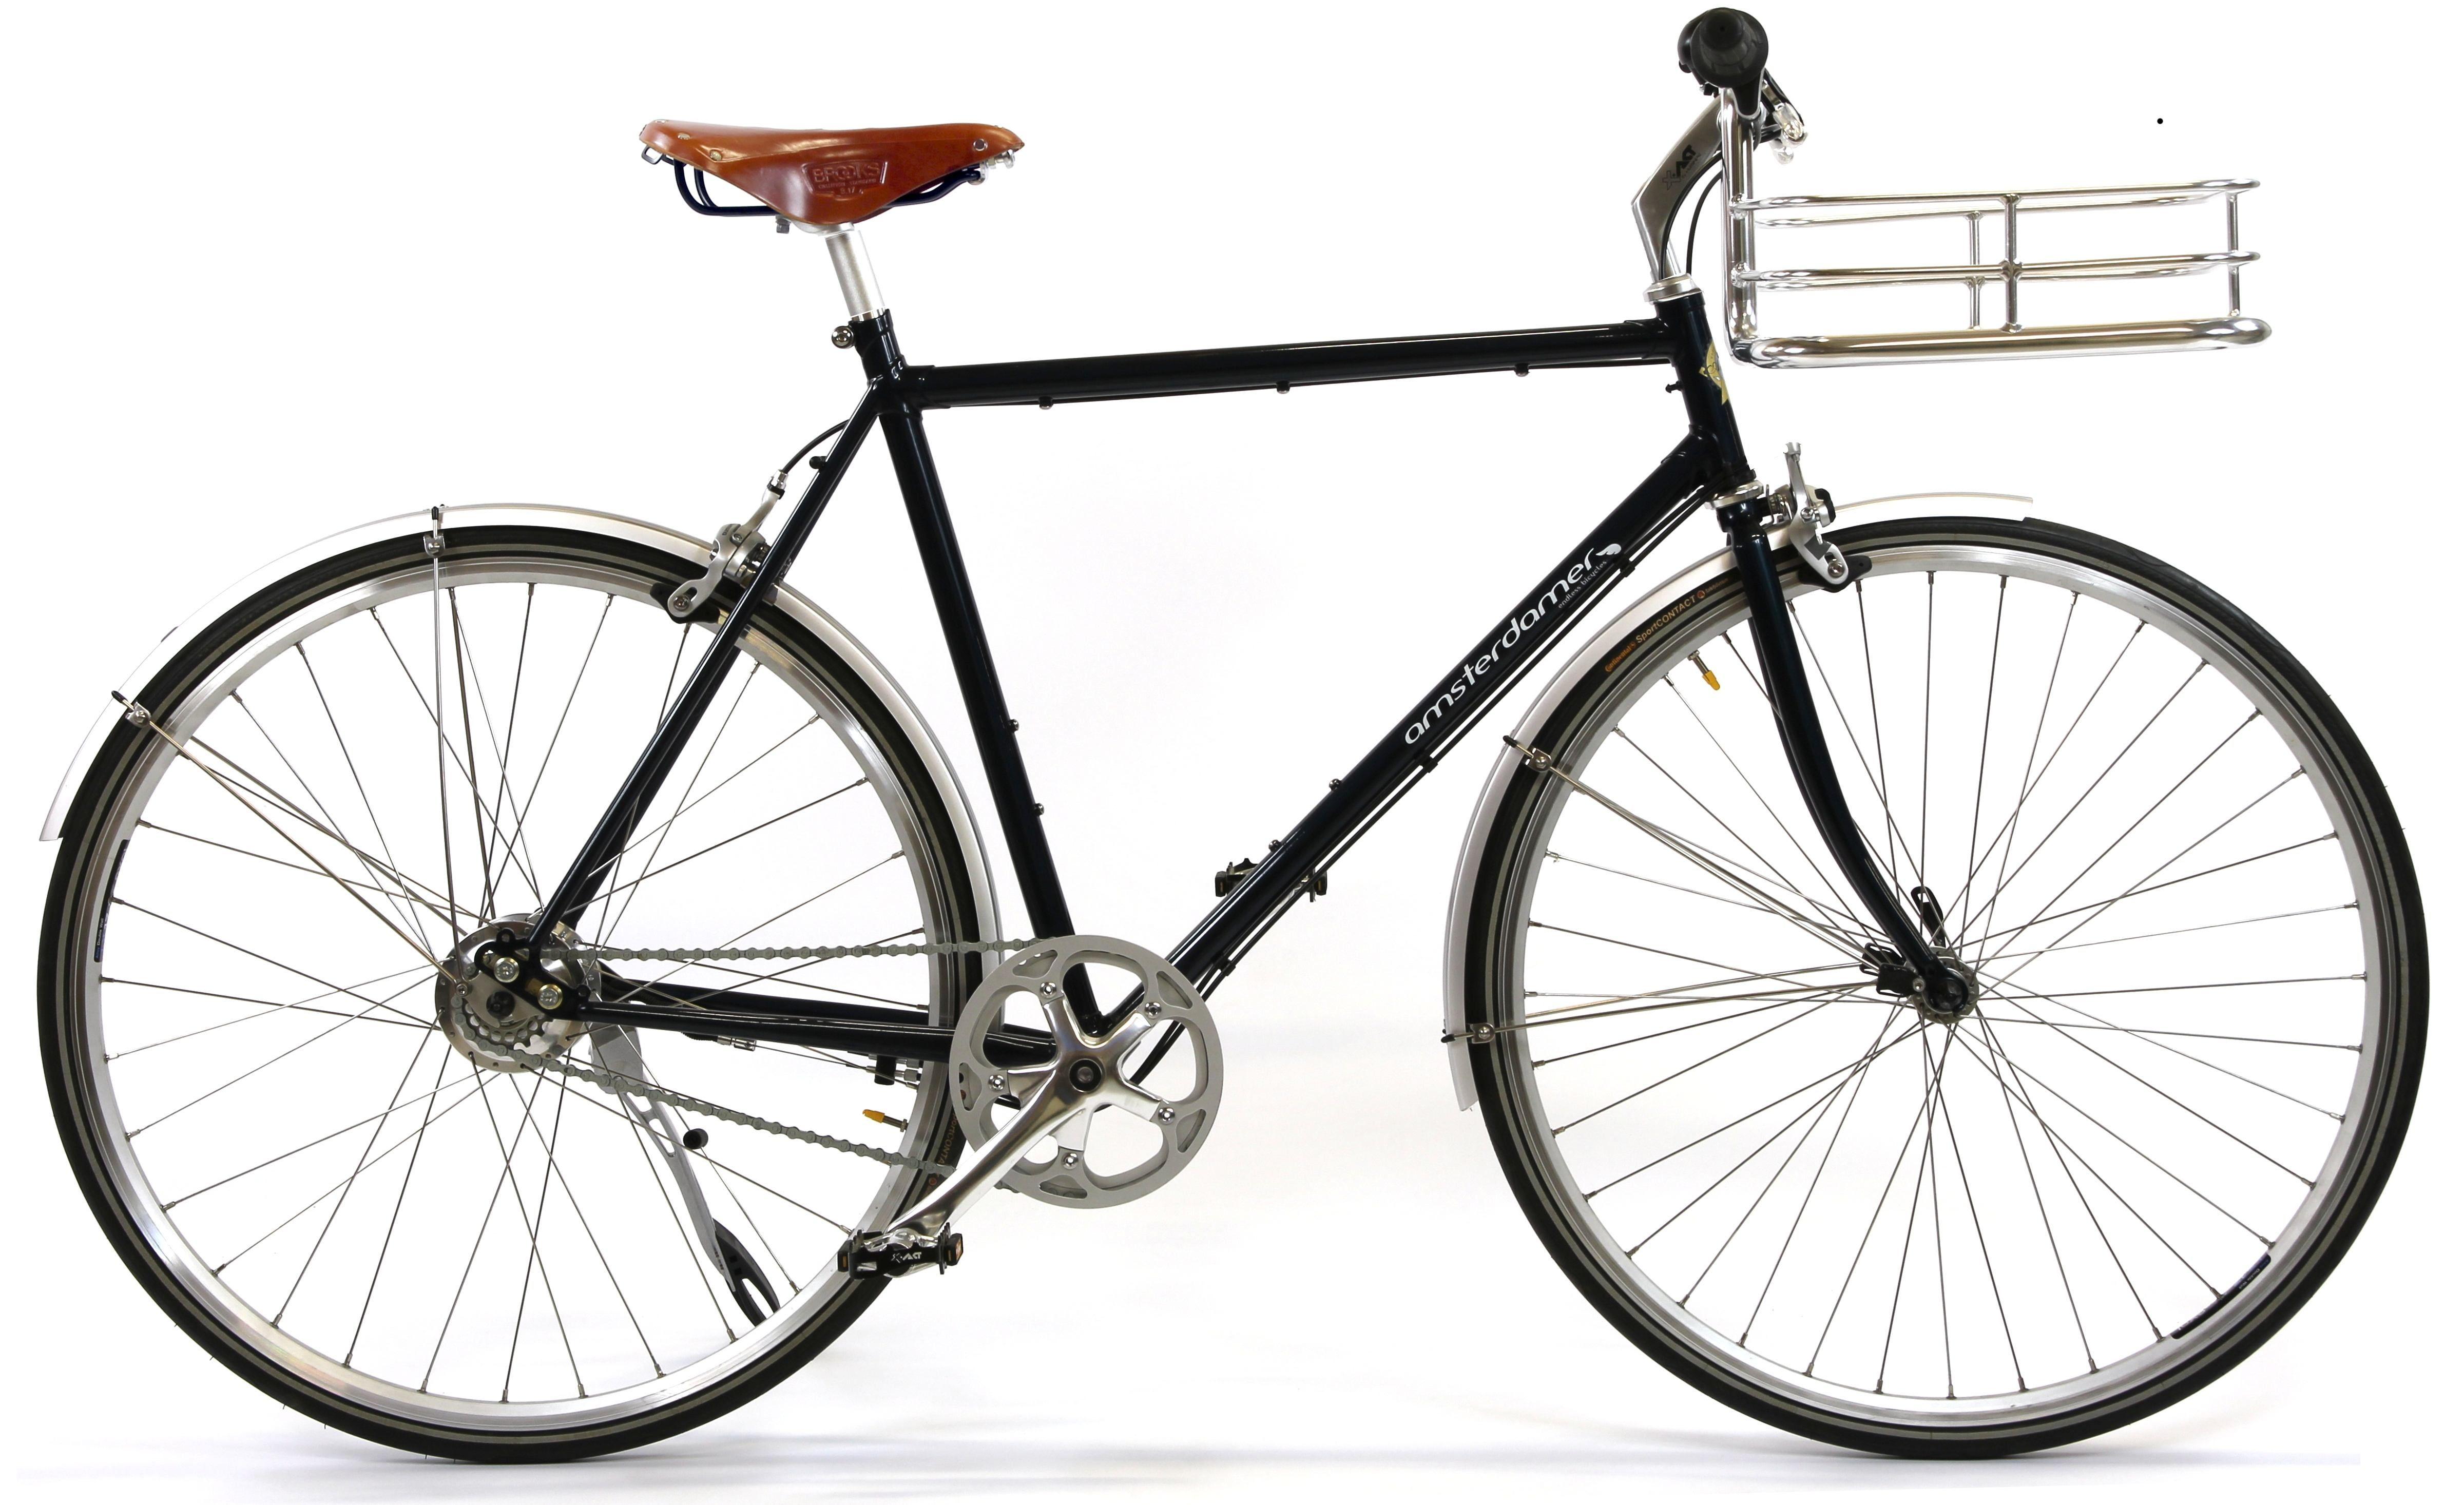 Accroche Velo intérieur velo agathe high porte bagage cadre homme | bike | pinterest